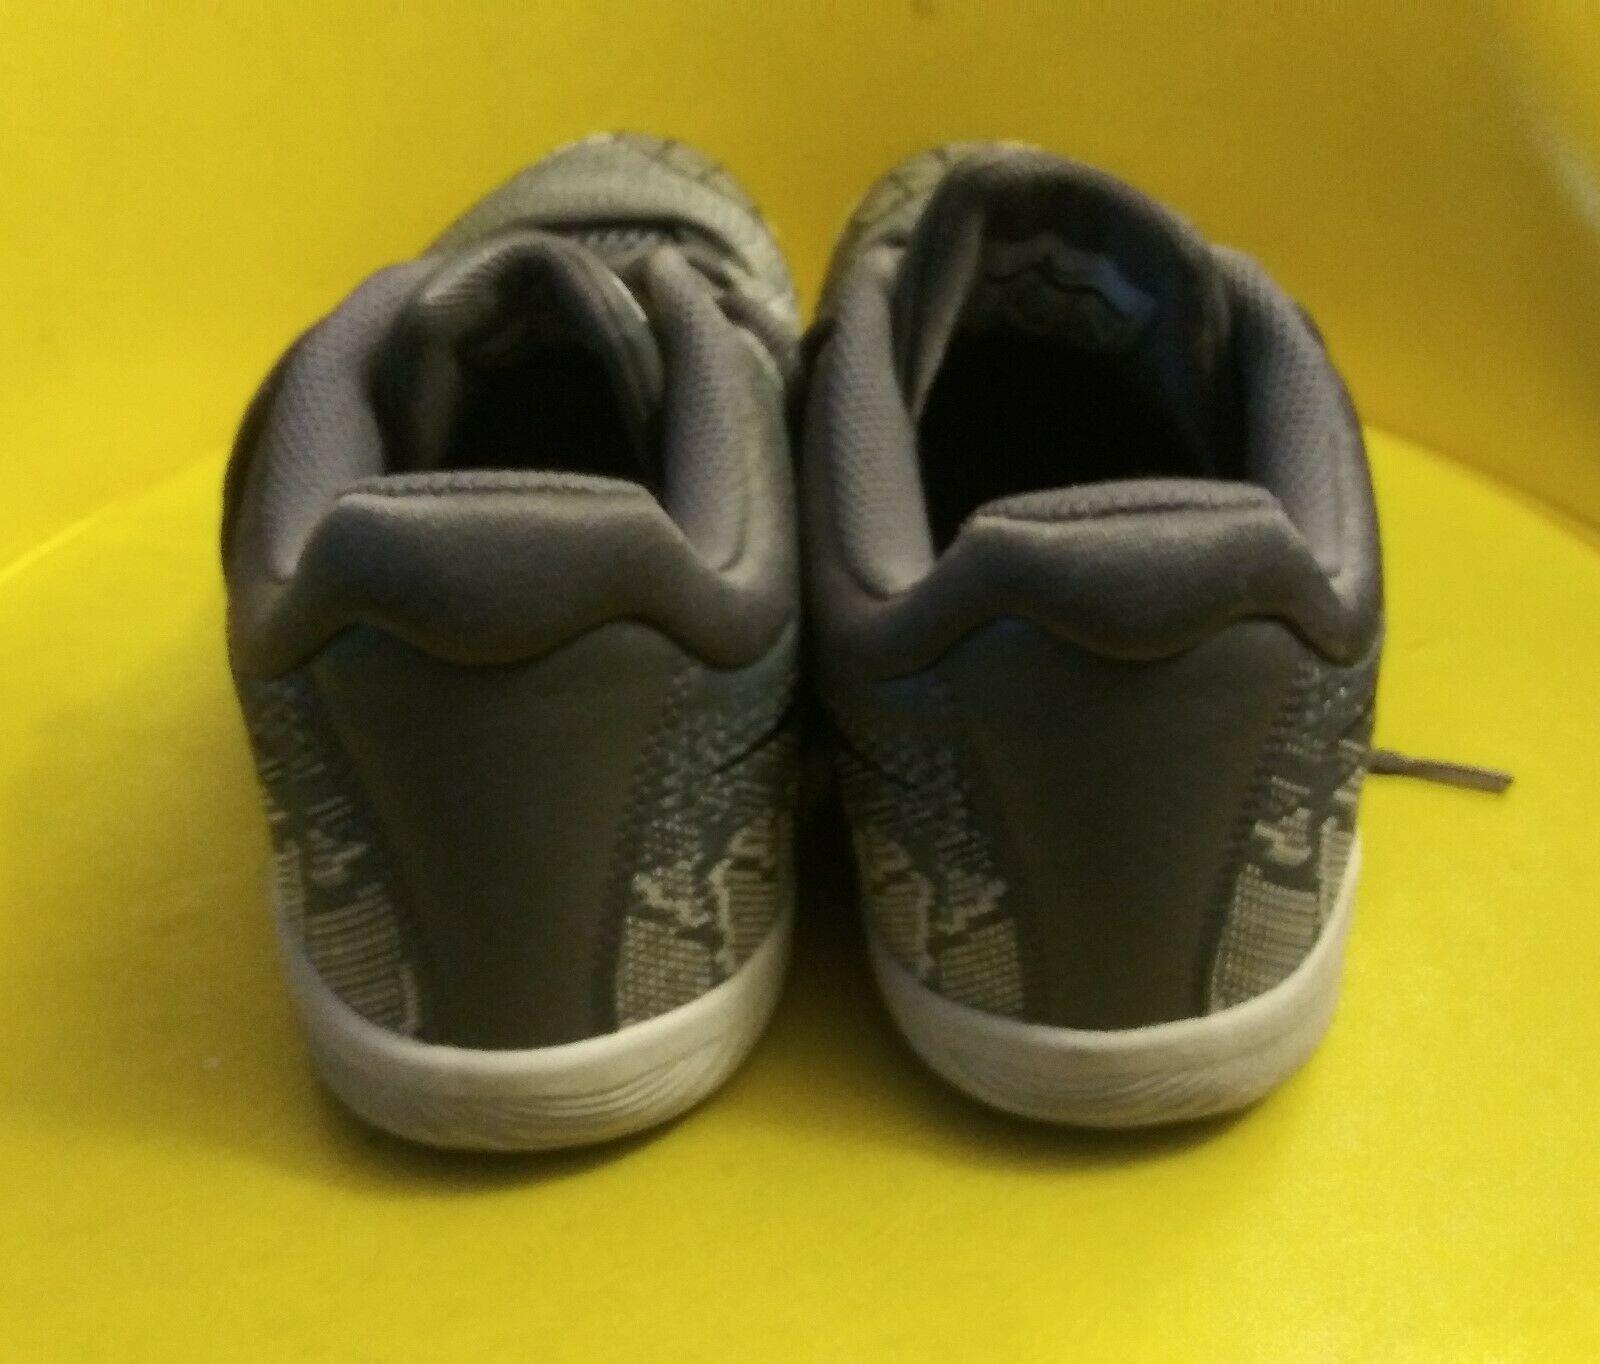 NIKE Kobe Mamba Rage Basketball Shoe 908972-011 Size US 8 / EUR 41 image 3